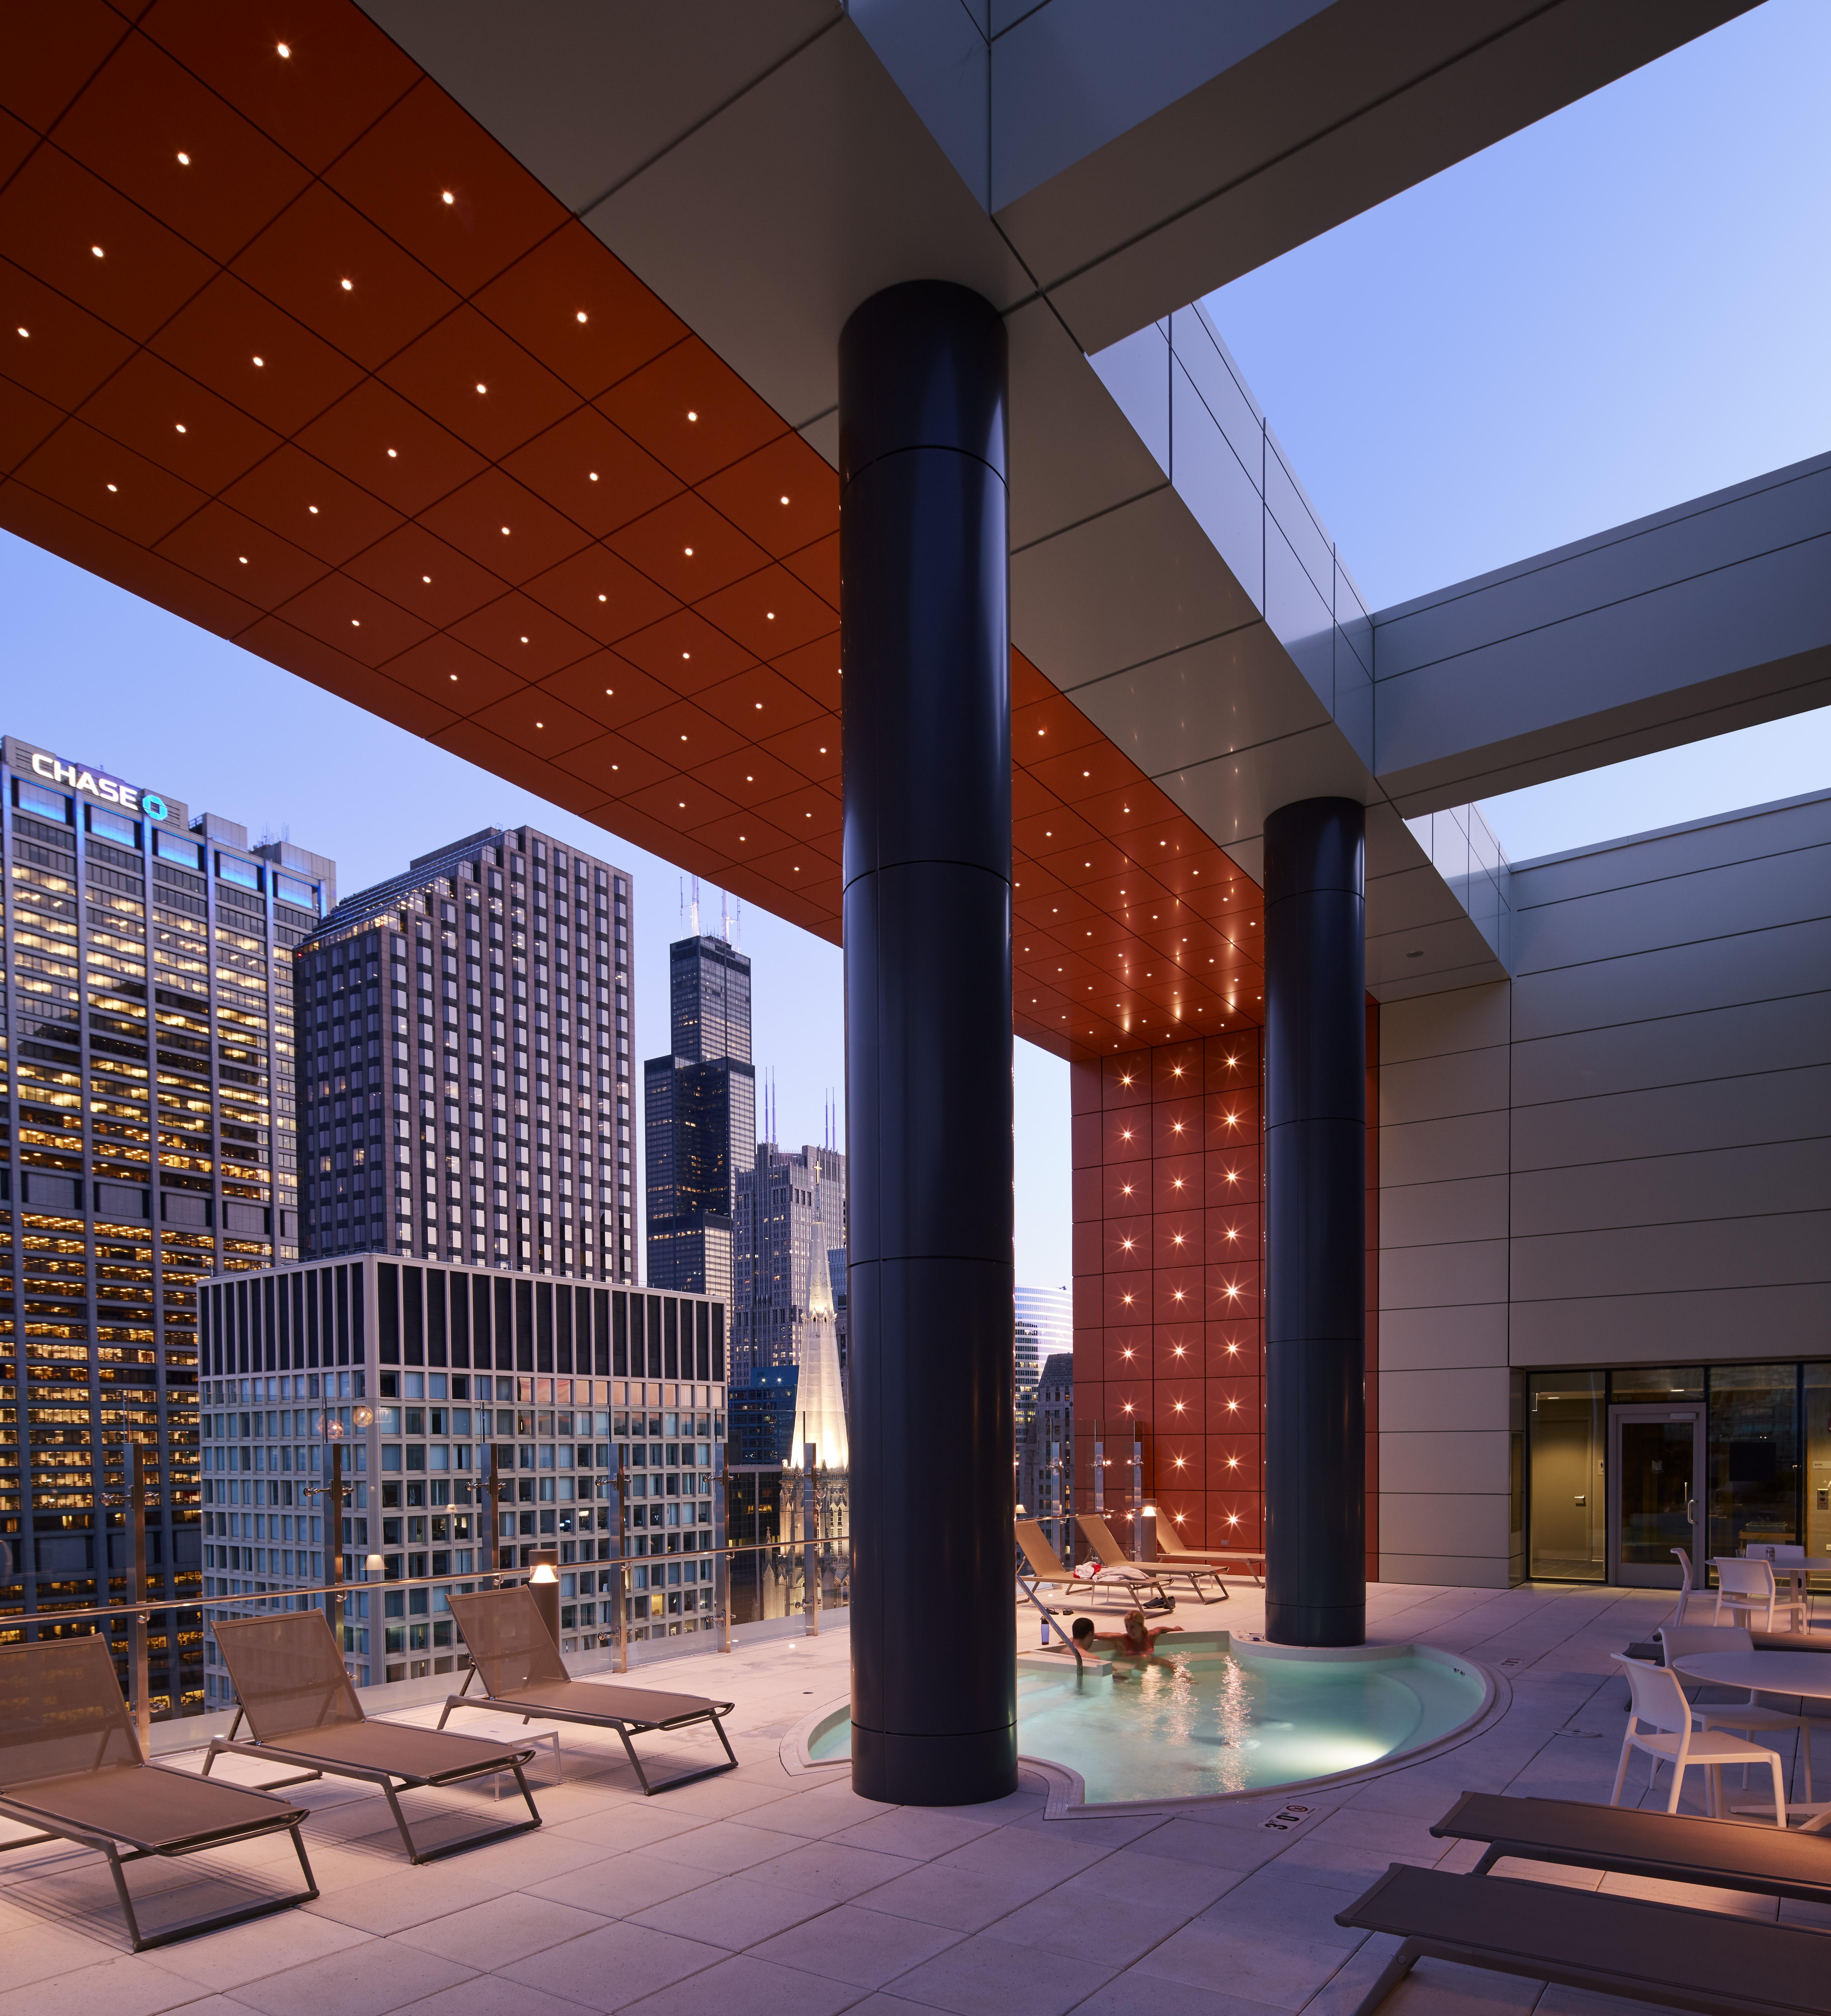 Best Apartment Finder Chicago: Marquee At Block 37